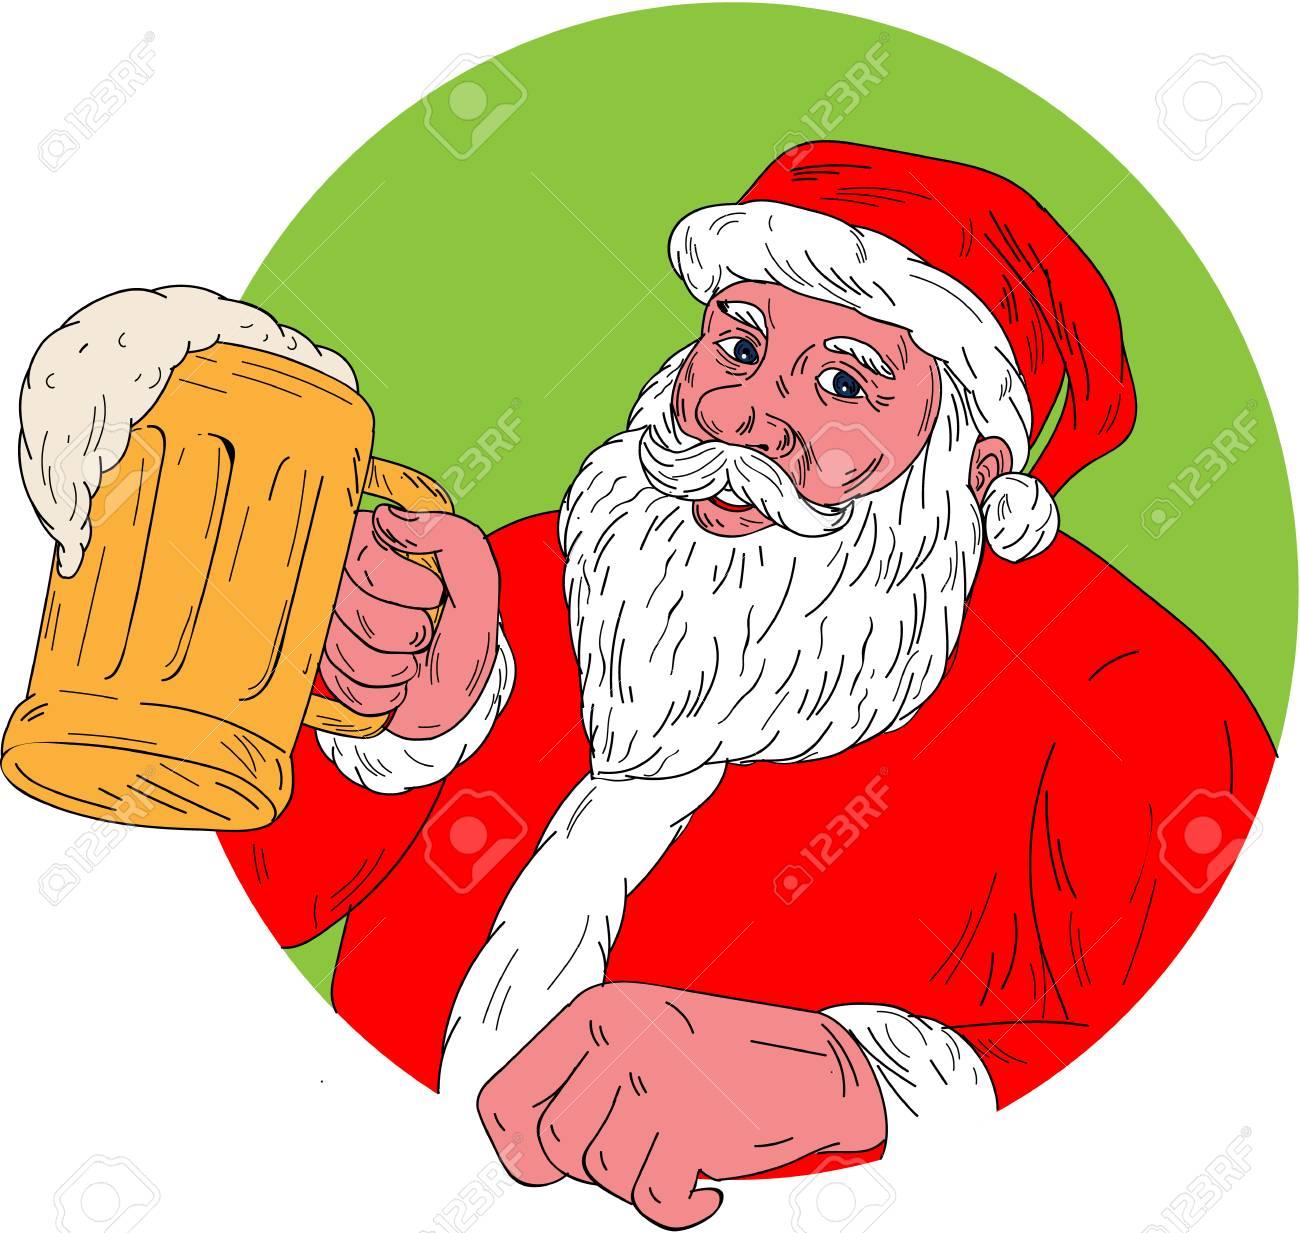 1300x1233 Drawing Sketch Style Illustration Of Santa Claus Smiling Facing